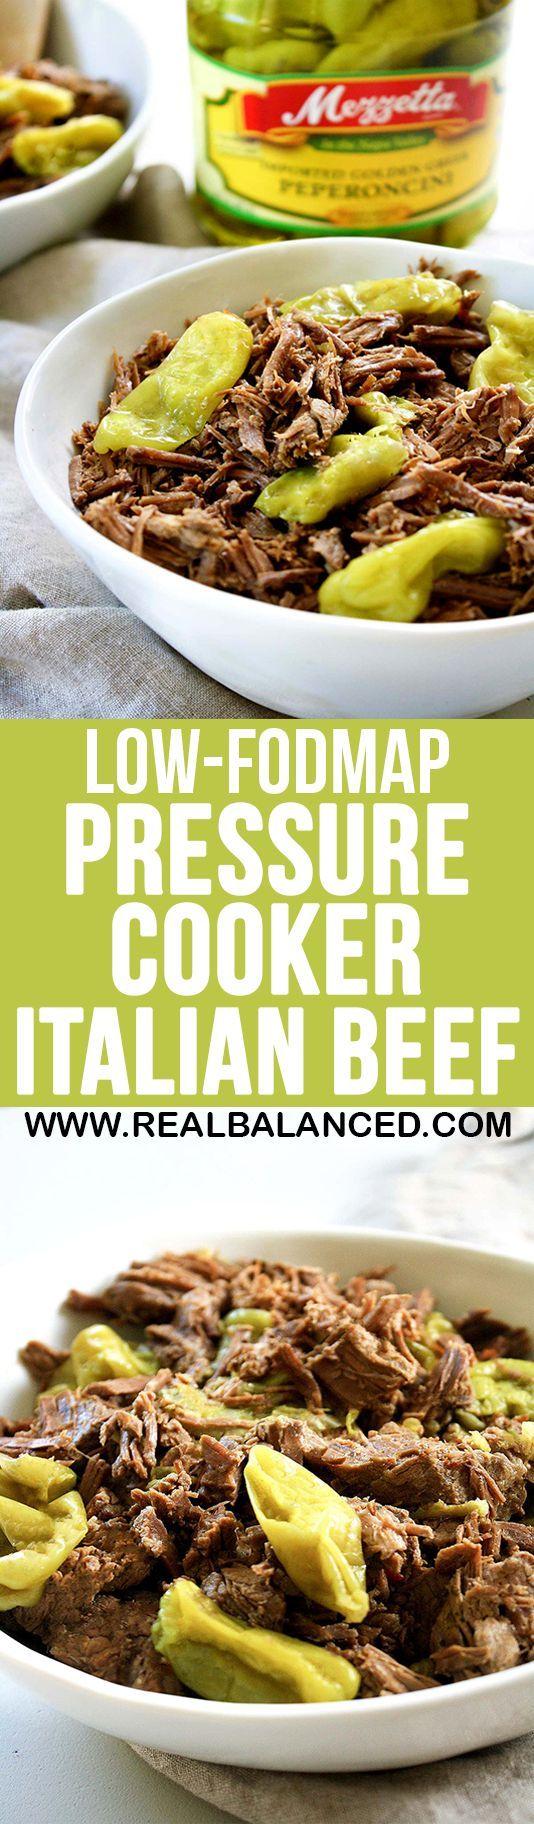 #sponsored Low-FODMAP Pressure Cooker Italian Beef: low-FODMAP, low-carb, keto, gluten-free, grain-free, dairy-free, & sugar-free!